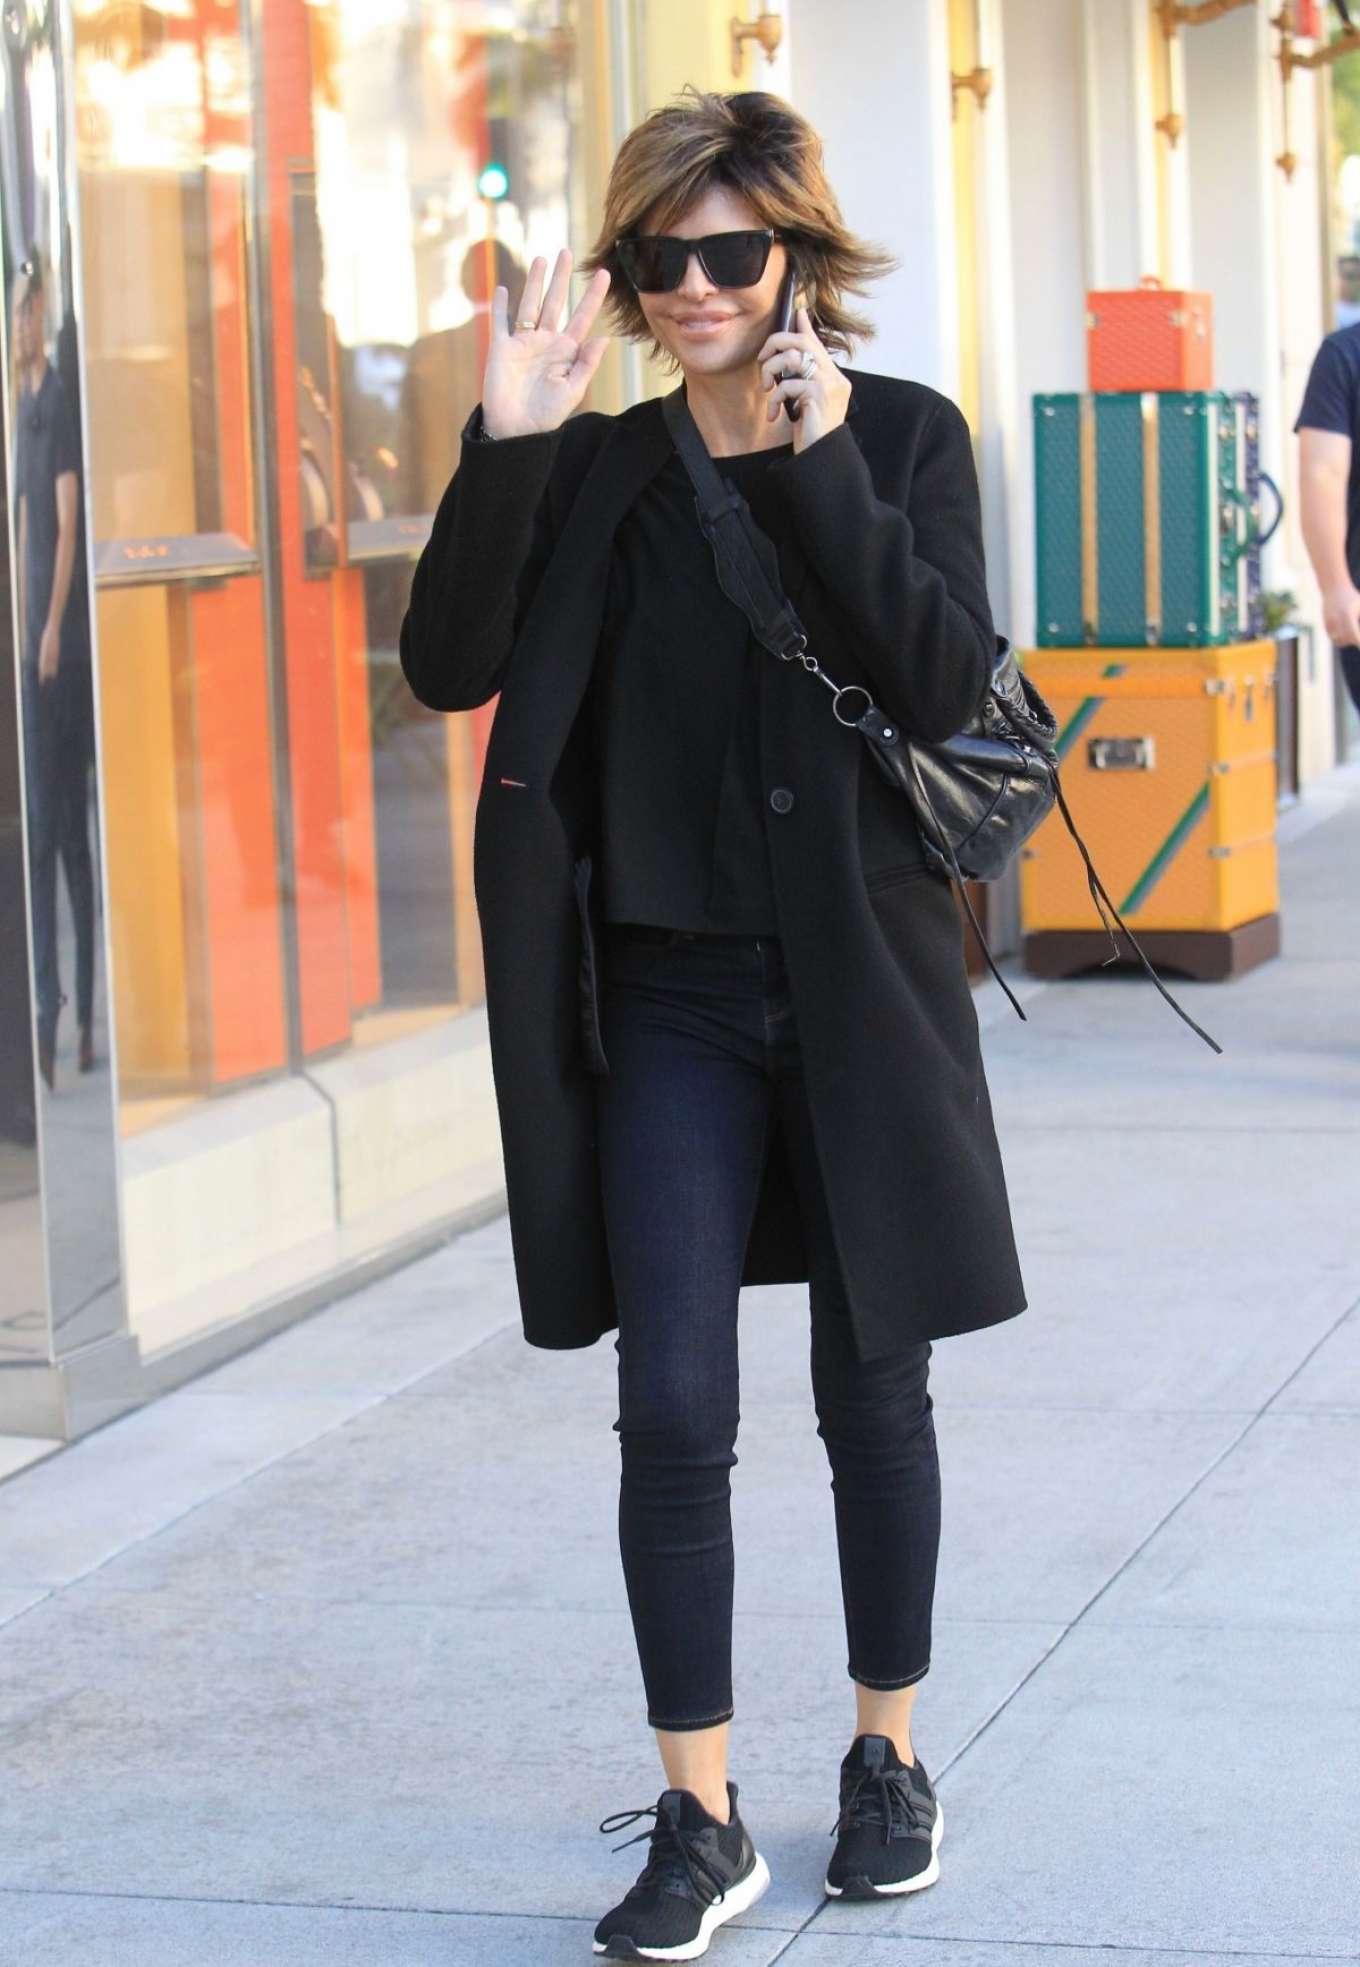 Lisa Rinna 2018 : Lisa Rinna: Shopping on Rodeo Drive -07